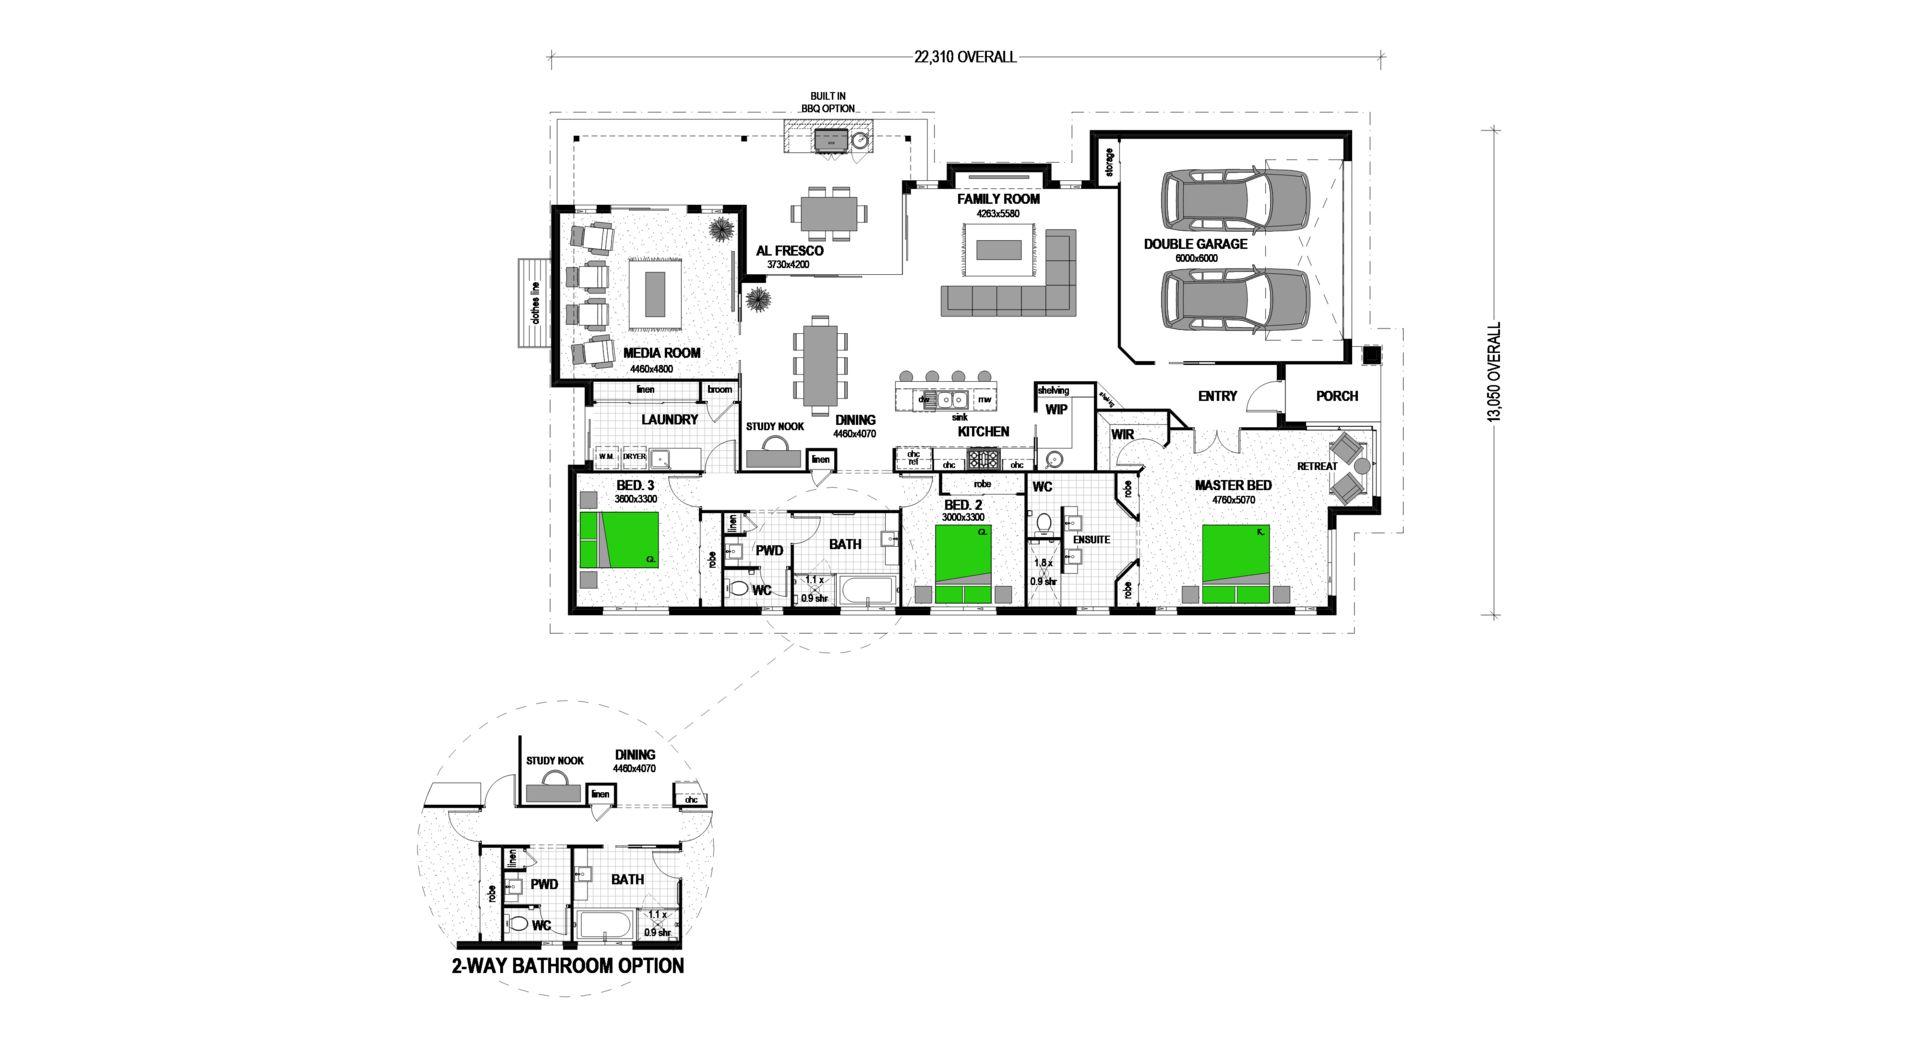 SOLD Lot 114 Fairley Village, Murrumbateman NSW 2582, Image 1